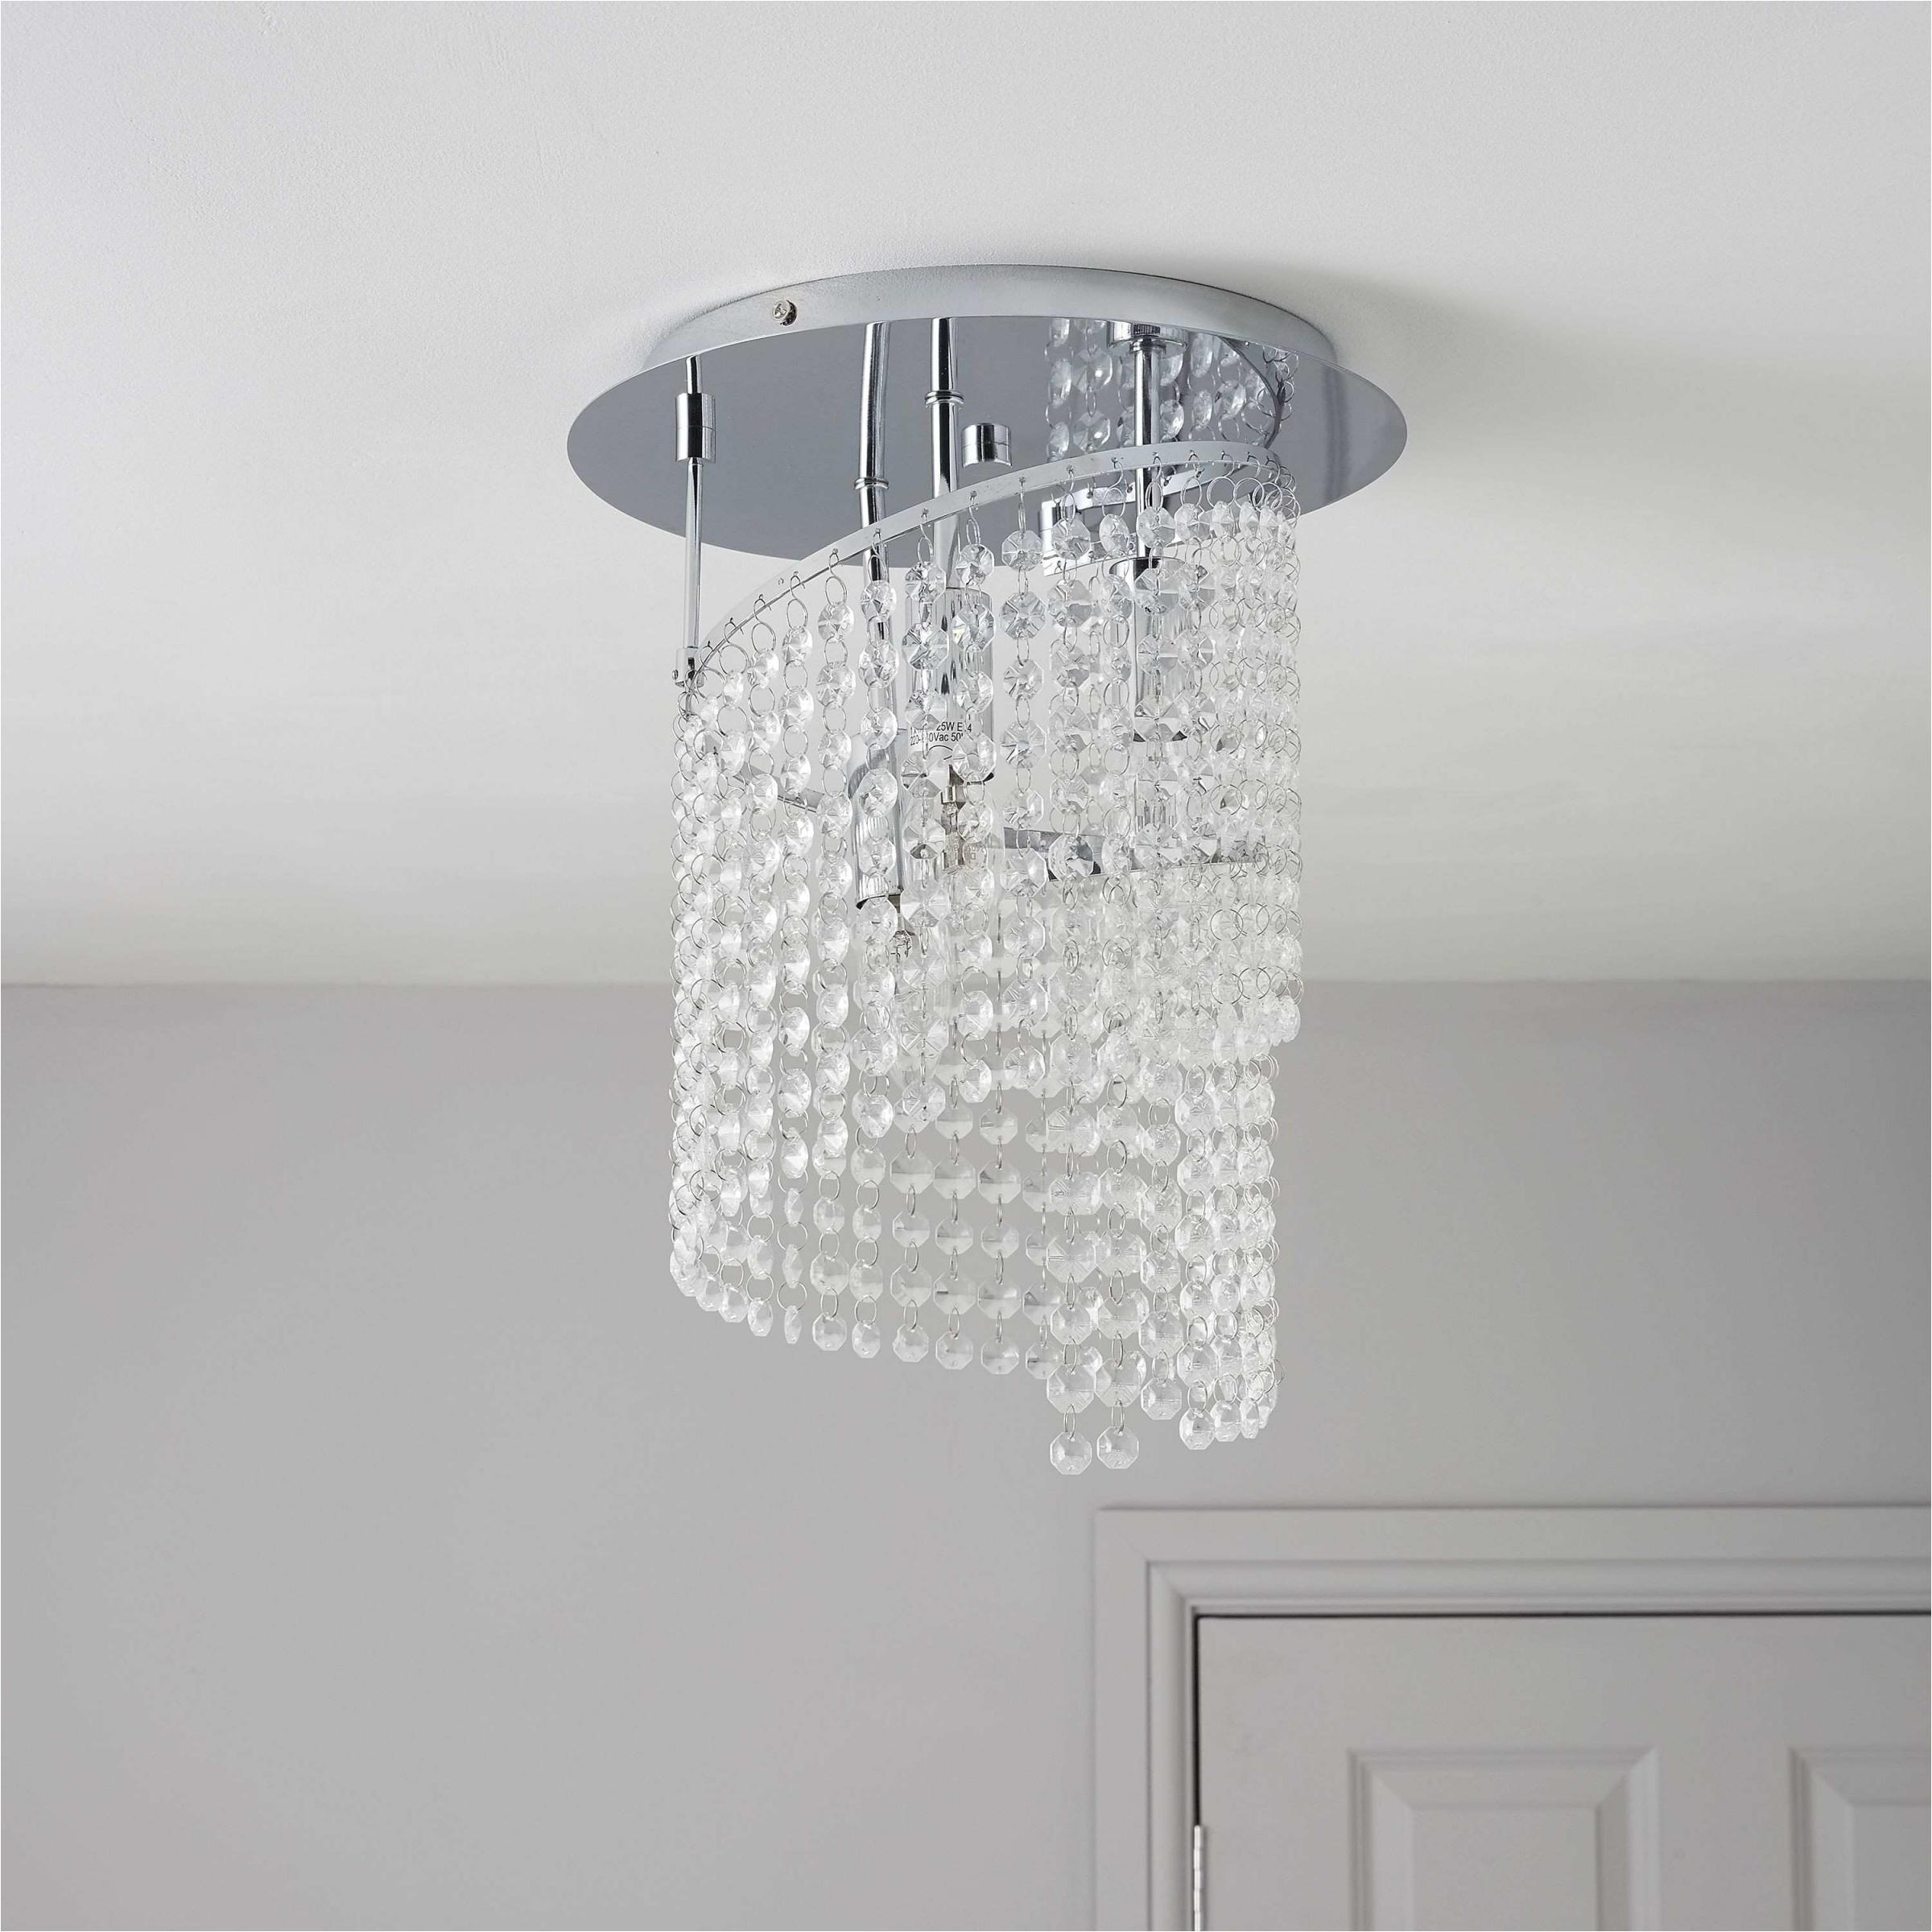 ceiling lights inspirational led pendant light fixtures unique 16 gem ring chandelier chb0039 0d